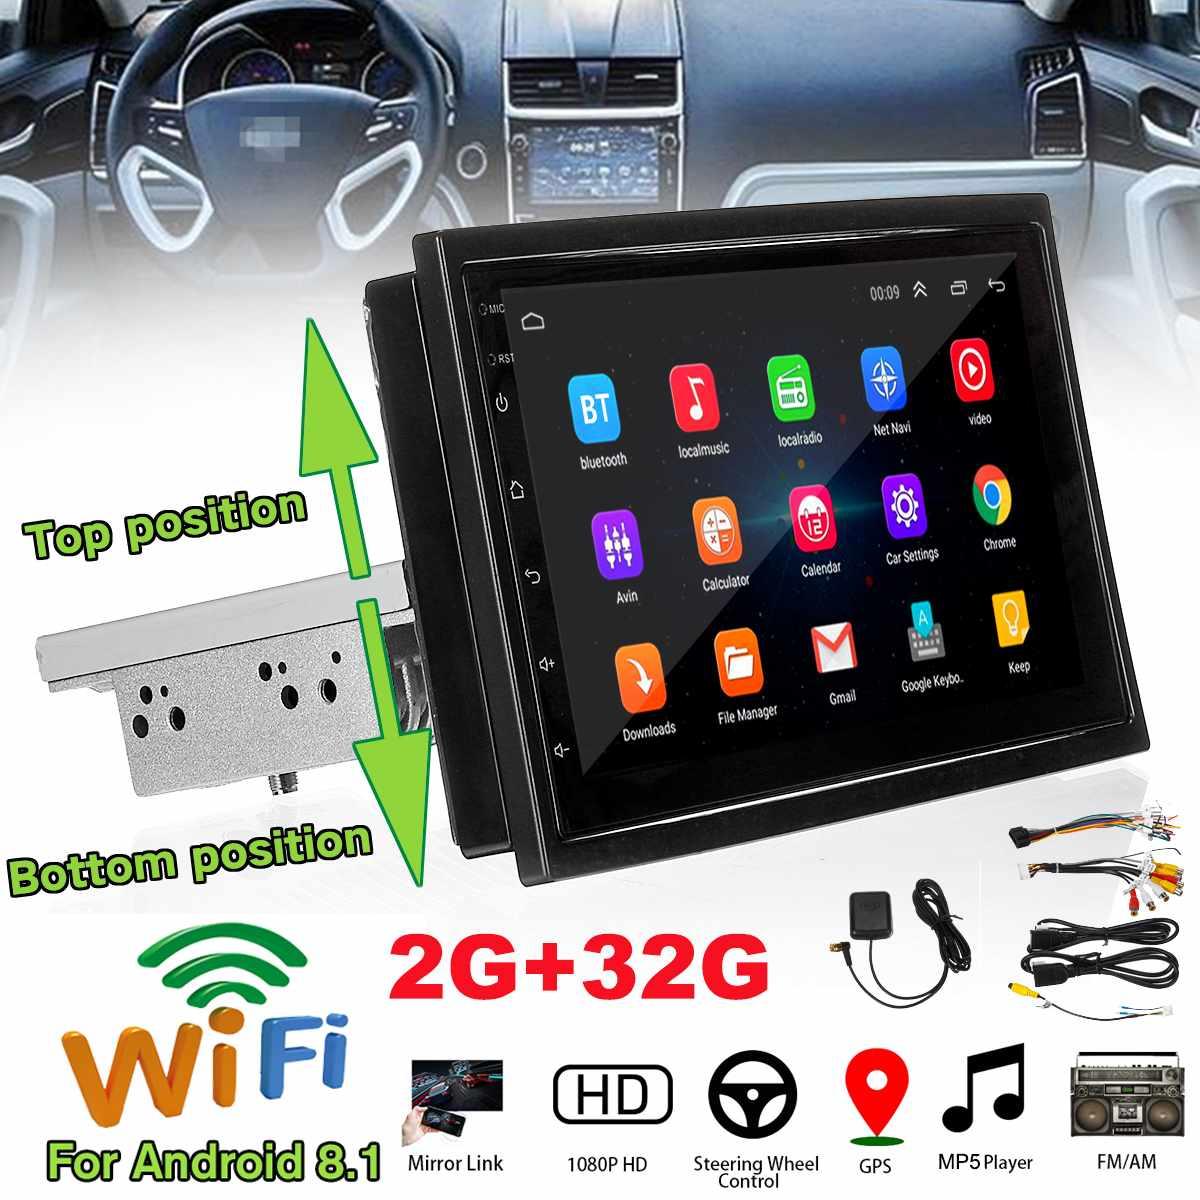 Car Radio 1 Din Car Radio Bluetooth Wifi Car Player Navigation All-in-One Machine Android 8.1 32G Memory Car Radio Mirror 7 Inch